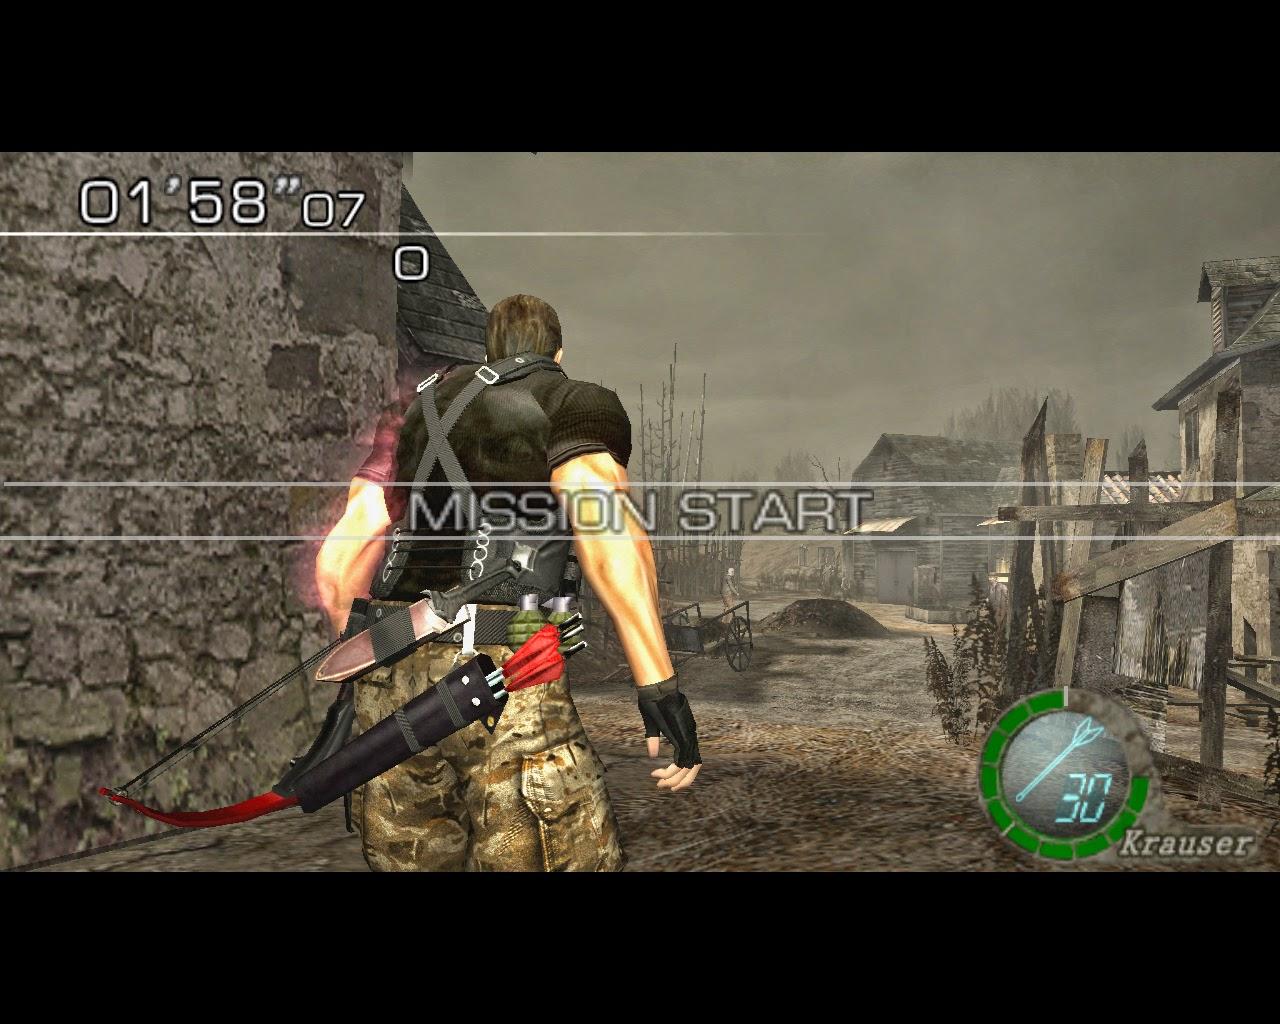 [OFFLINE] Krauser Mega HD Game%2B2015-03-08%2B17-15-52-515